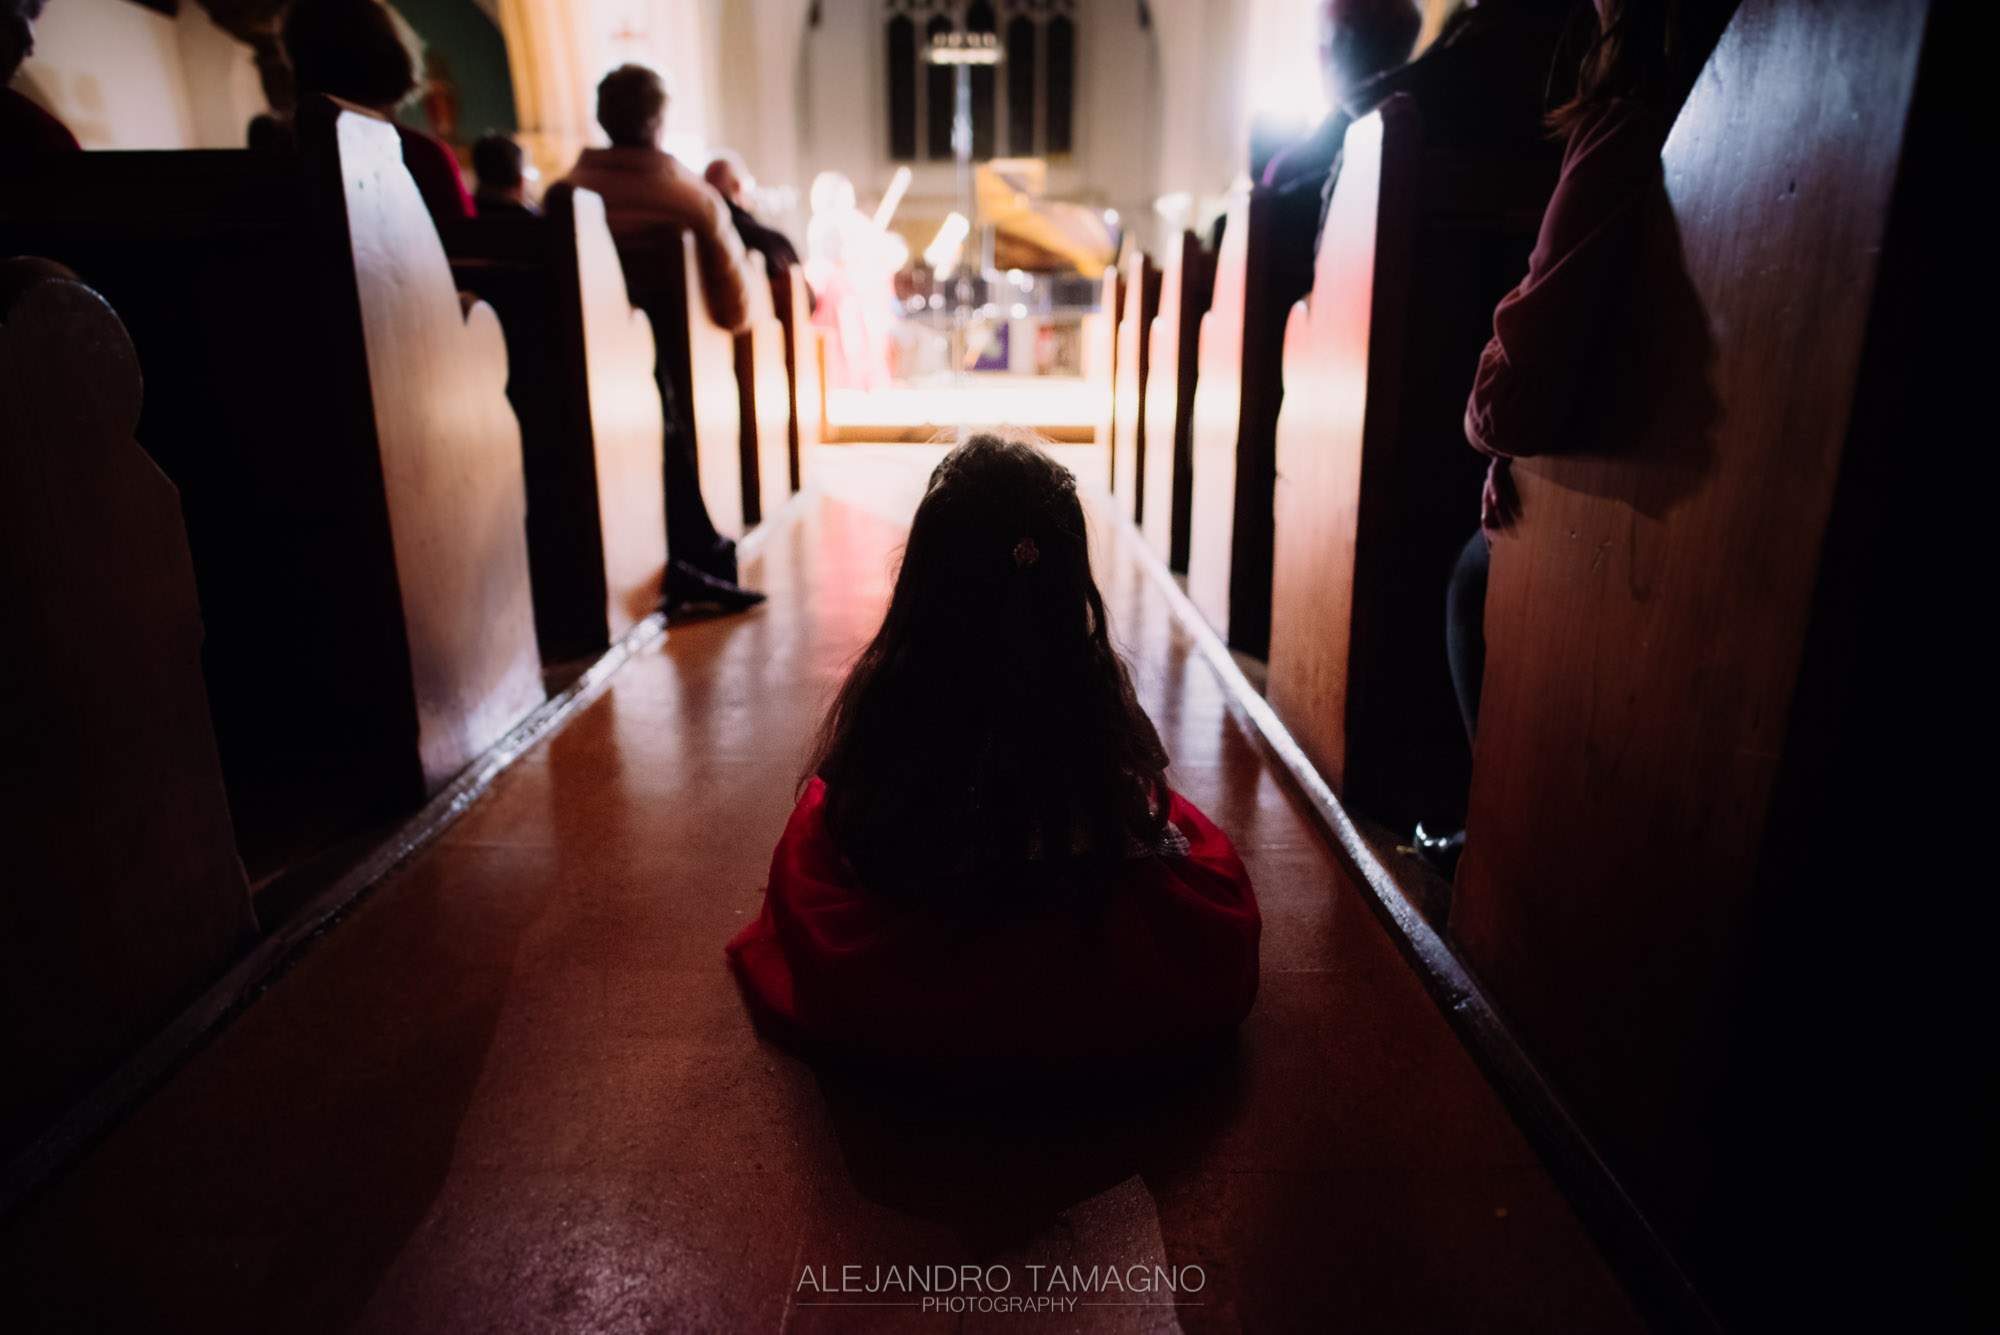 © Alejandro Tamagno 2017_ Jigsaw Player_Candlelight 02-12-2017 021.jpg